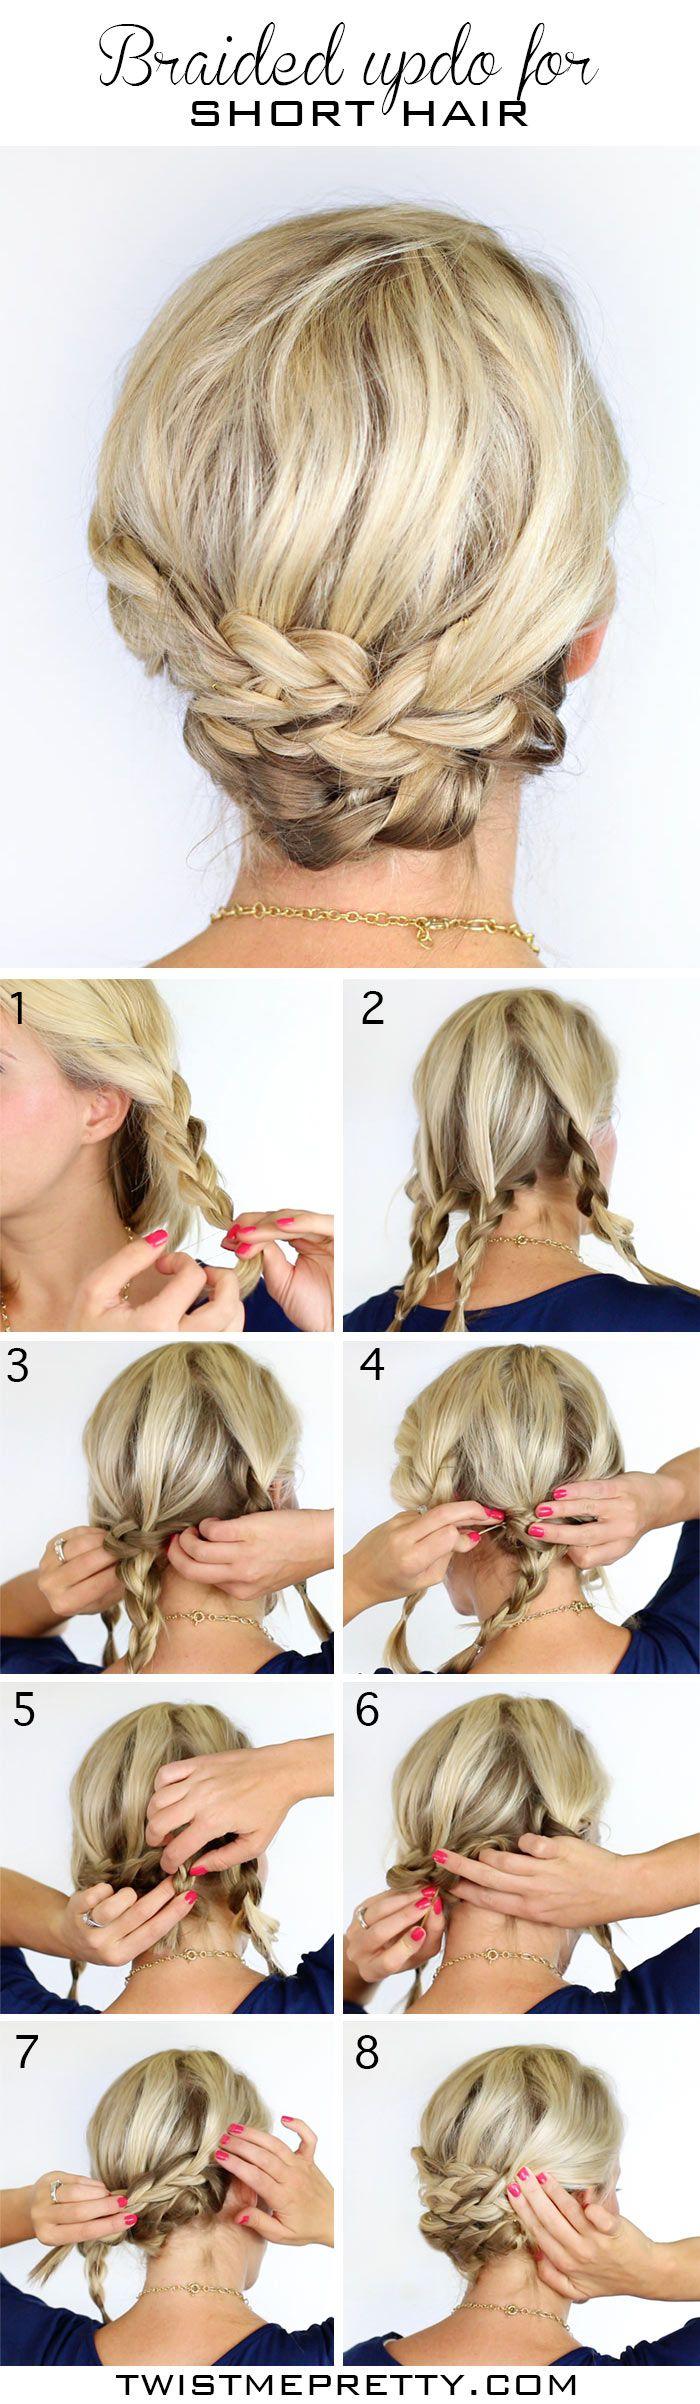 Coiffure chignon pour cheveux courts